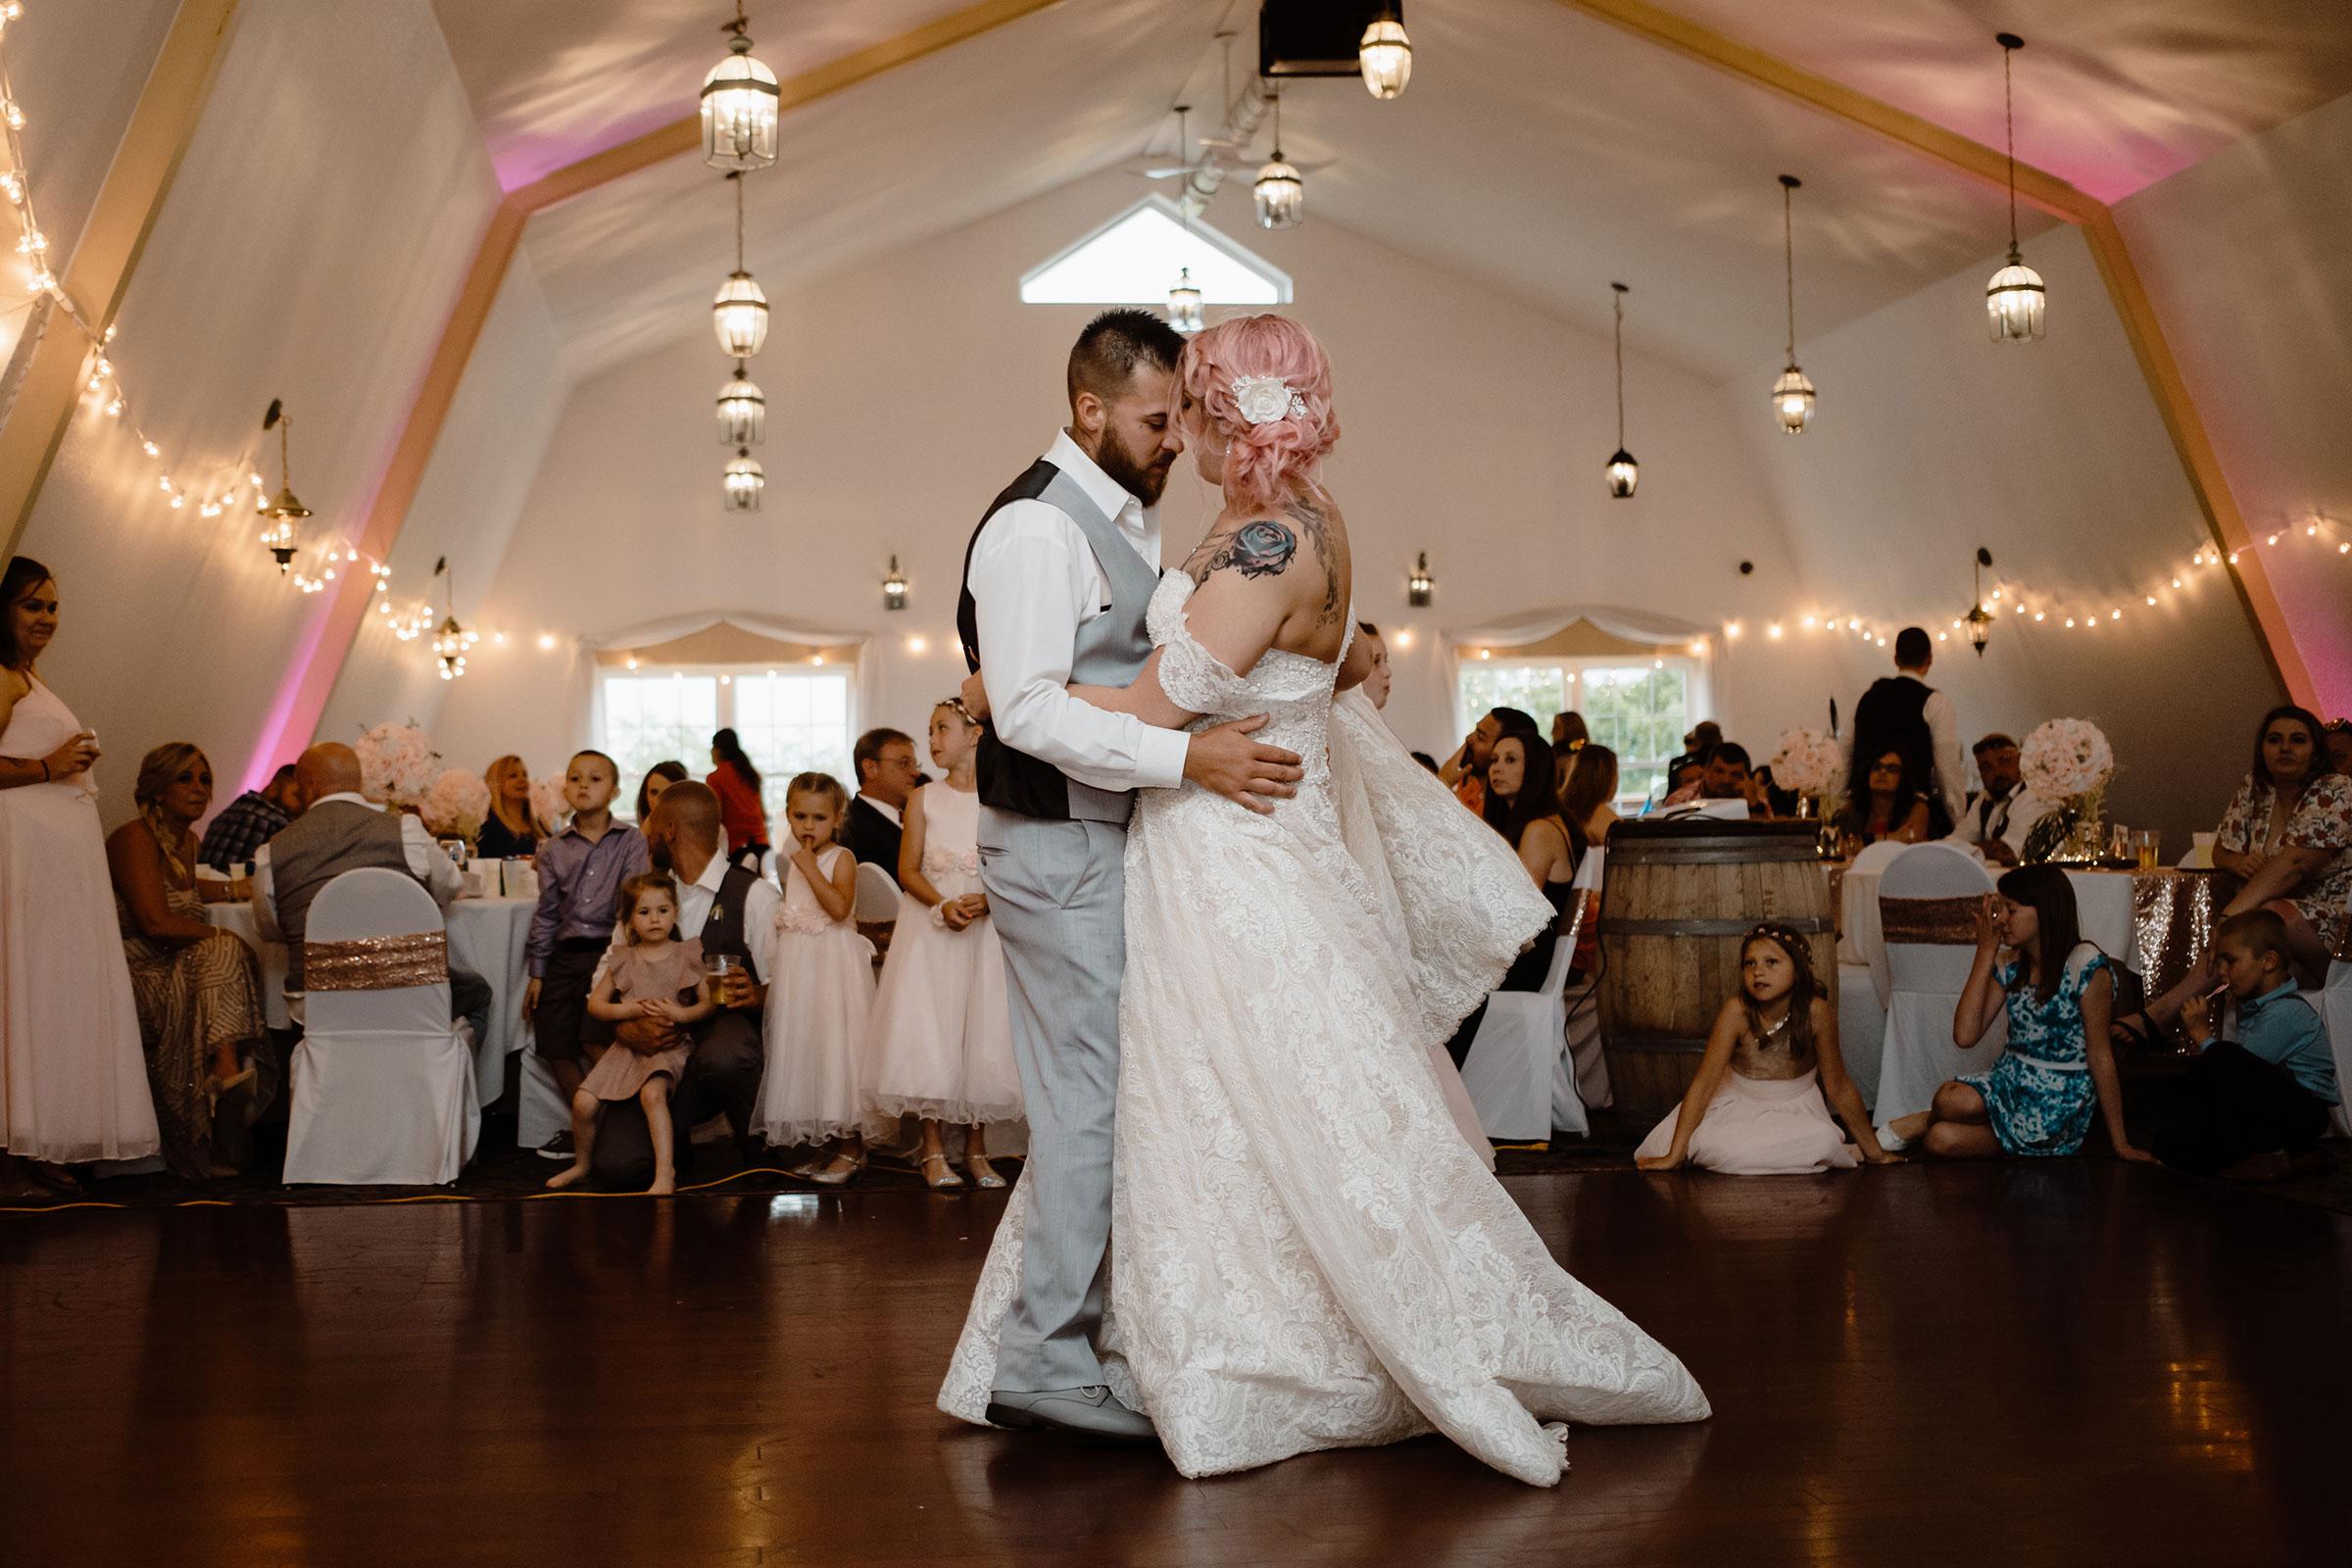 bride-groom-slow-dancing-wedding-summerset-winery-indianola-iowa-raelyn-ramey-photography.jpg